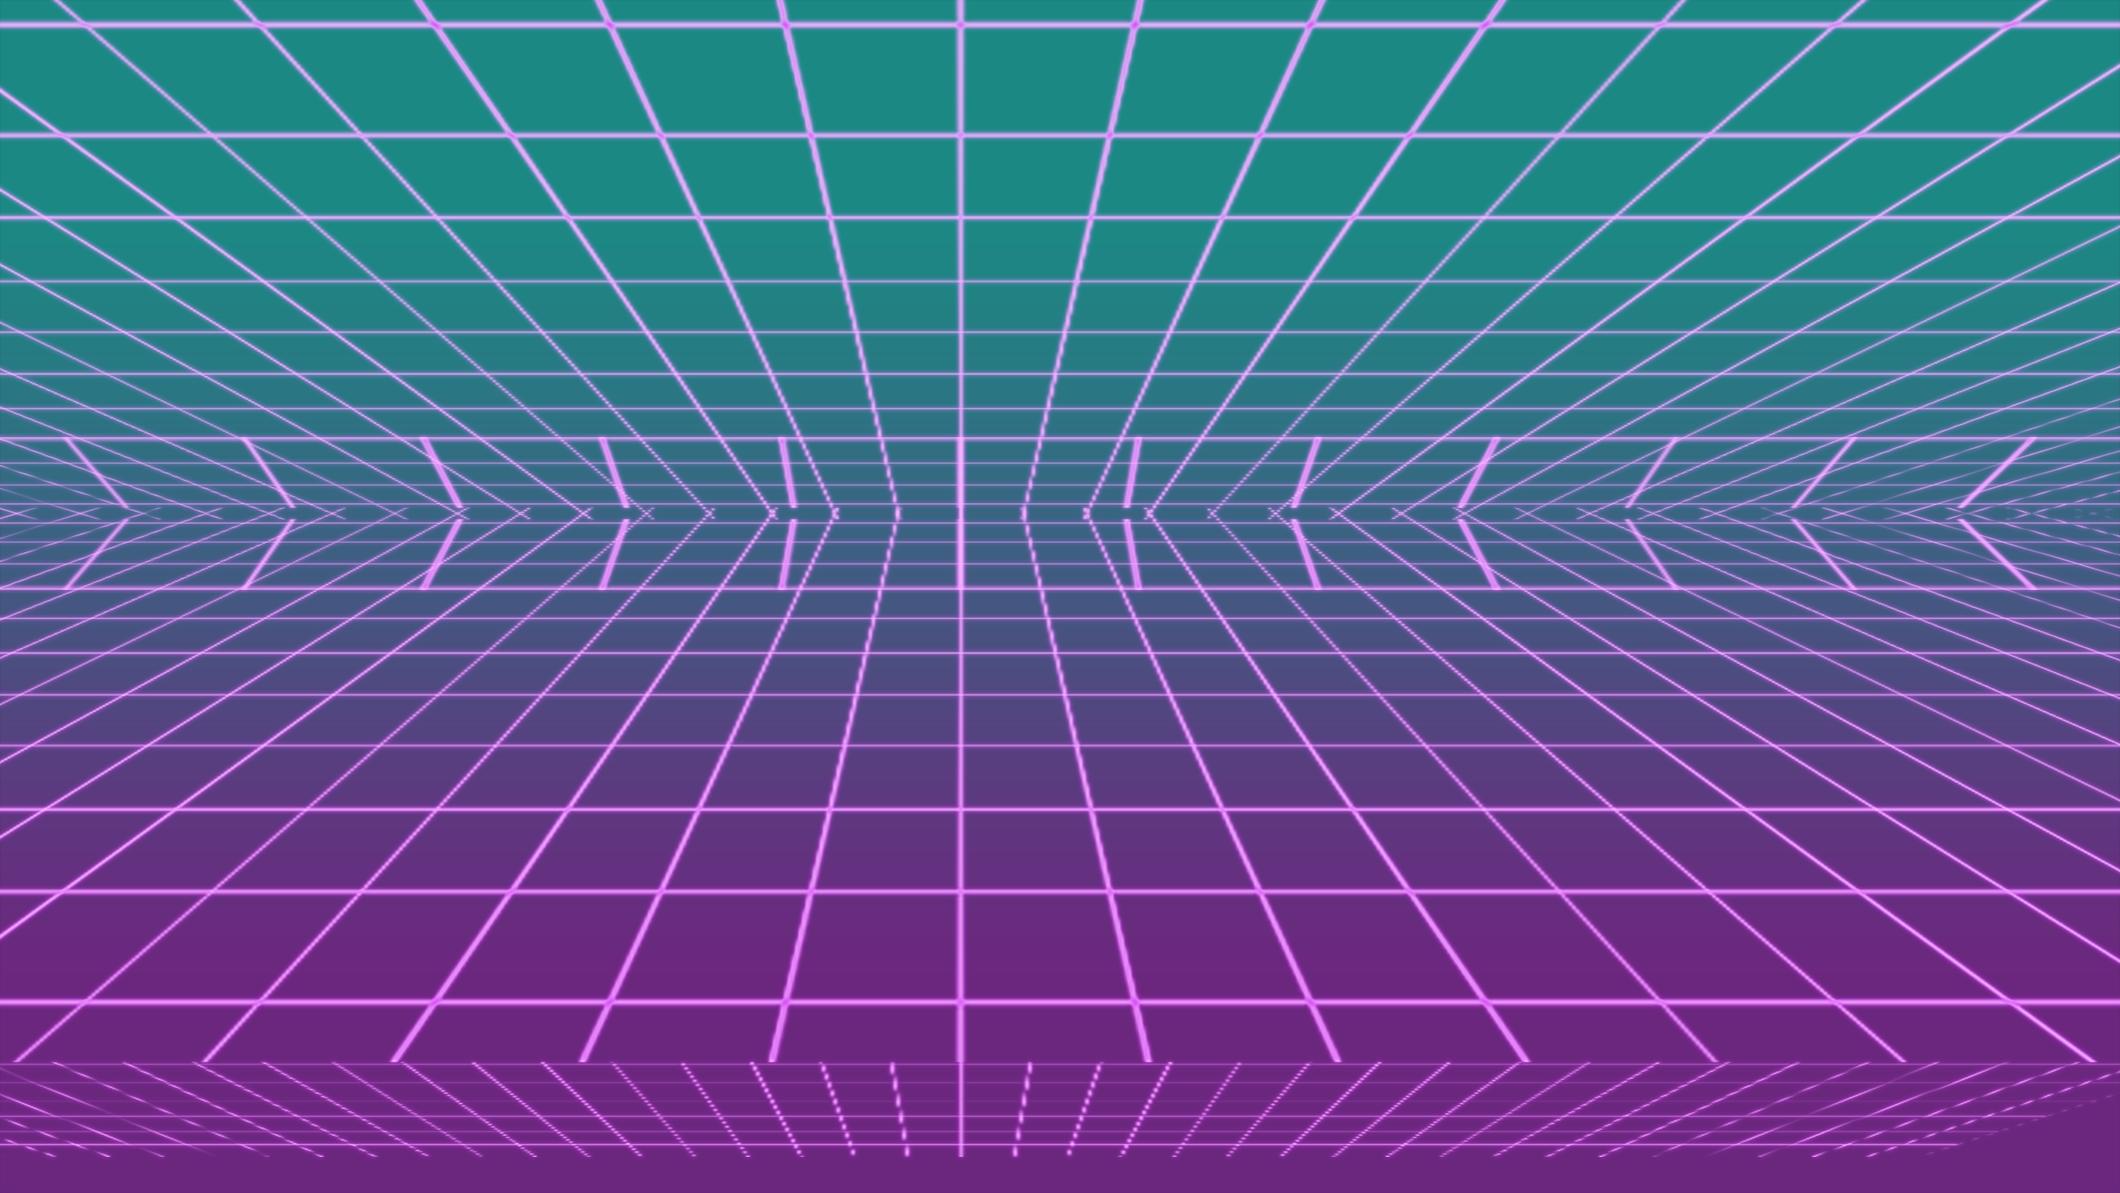 Resultado de imagem para vaporwave vaporwave in 2019 - Art aesthetic wallpaper ...